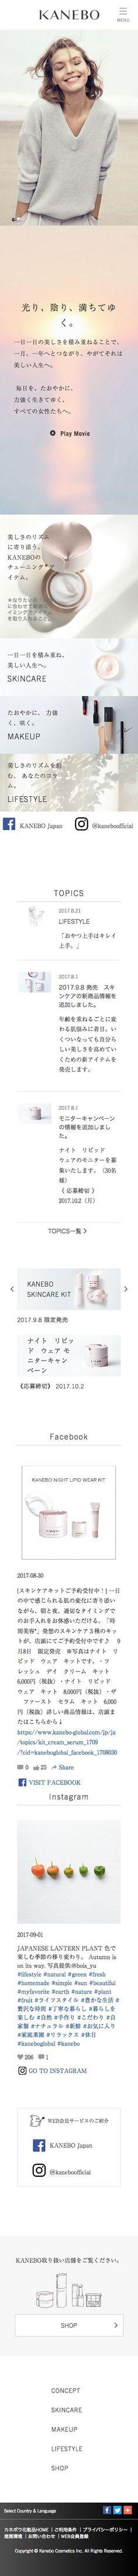 kanebo-global